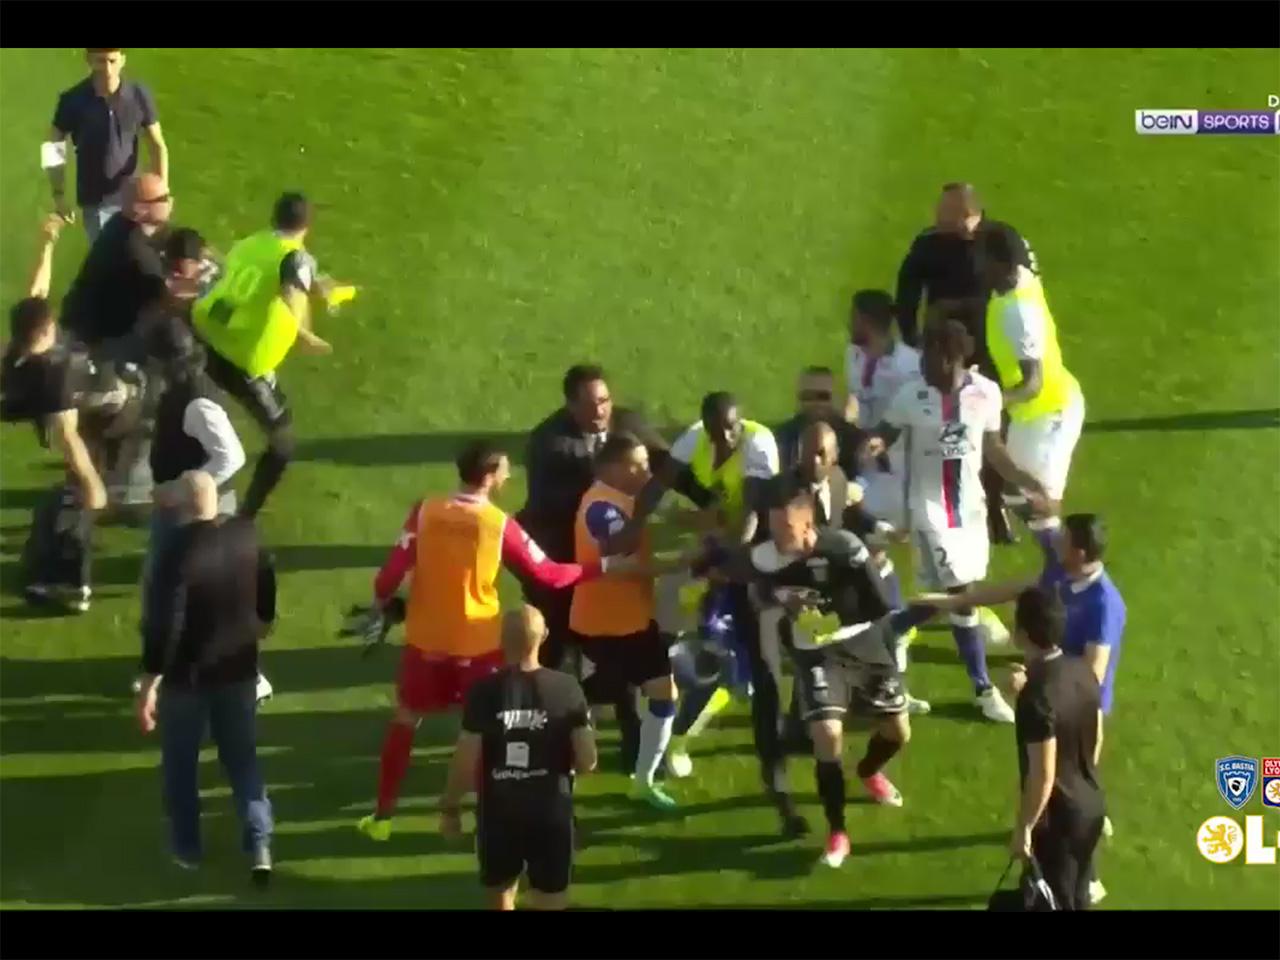 Bastia ol victoire sur tapis vert pour lyon - Lyon tapis vert ...